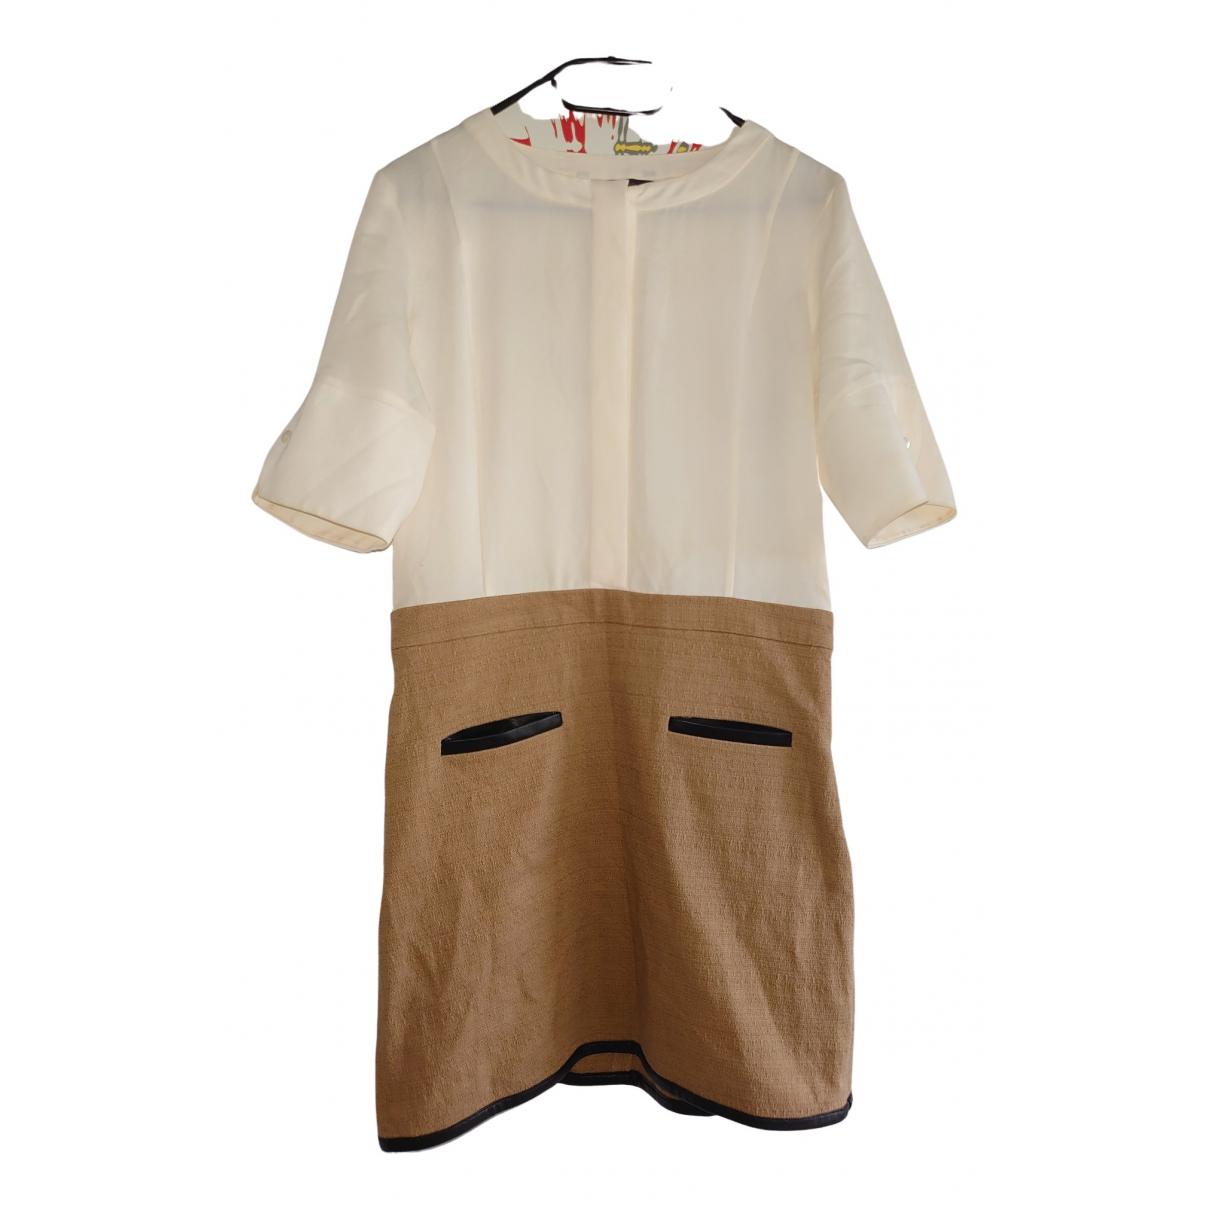 Emporio Armani N Beige Cotton dress for Women 8 UK